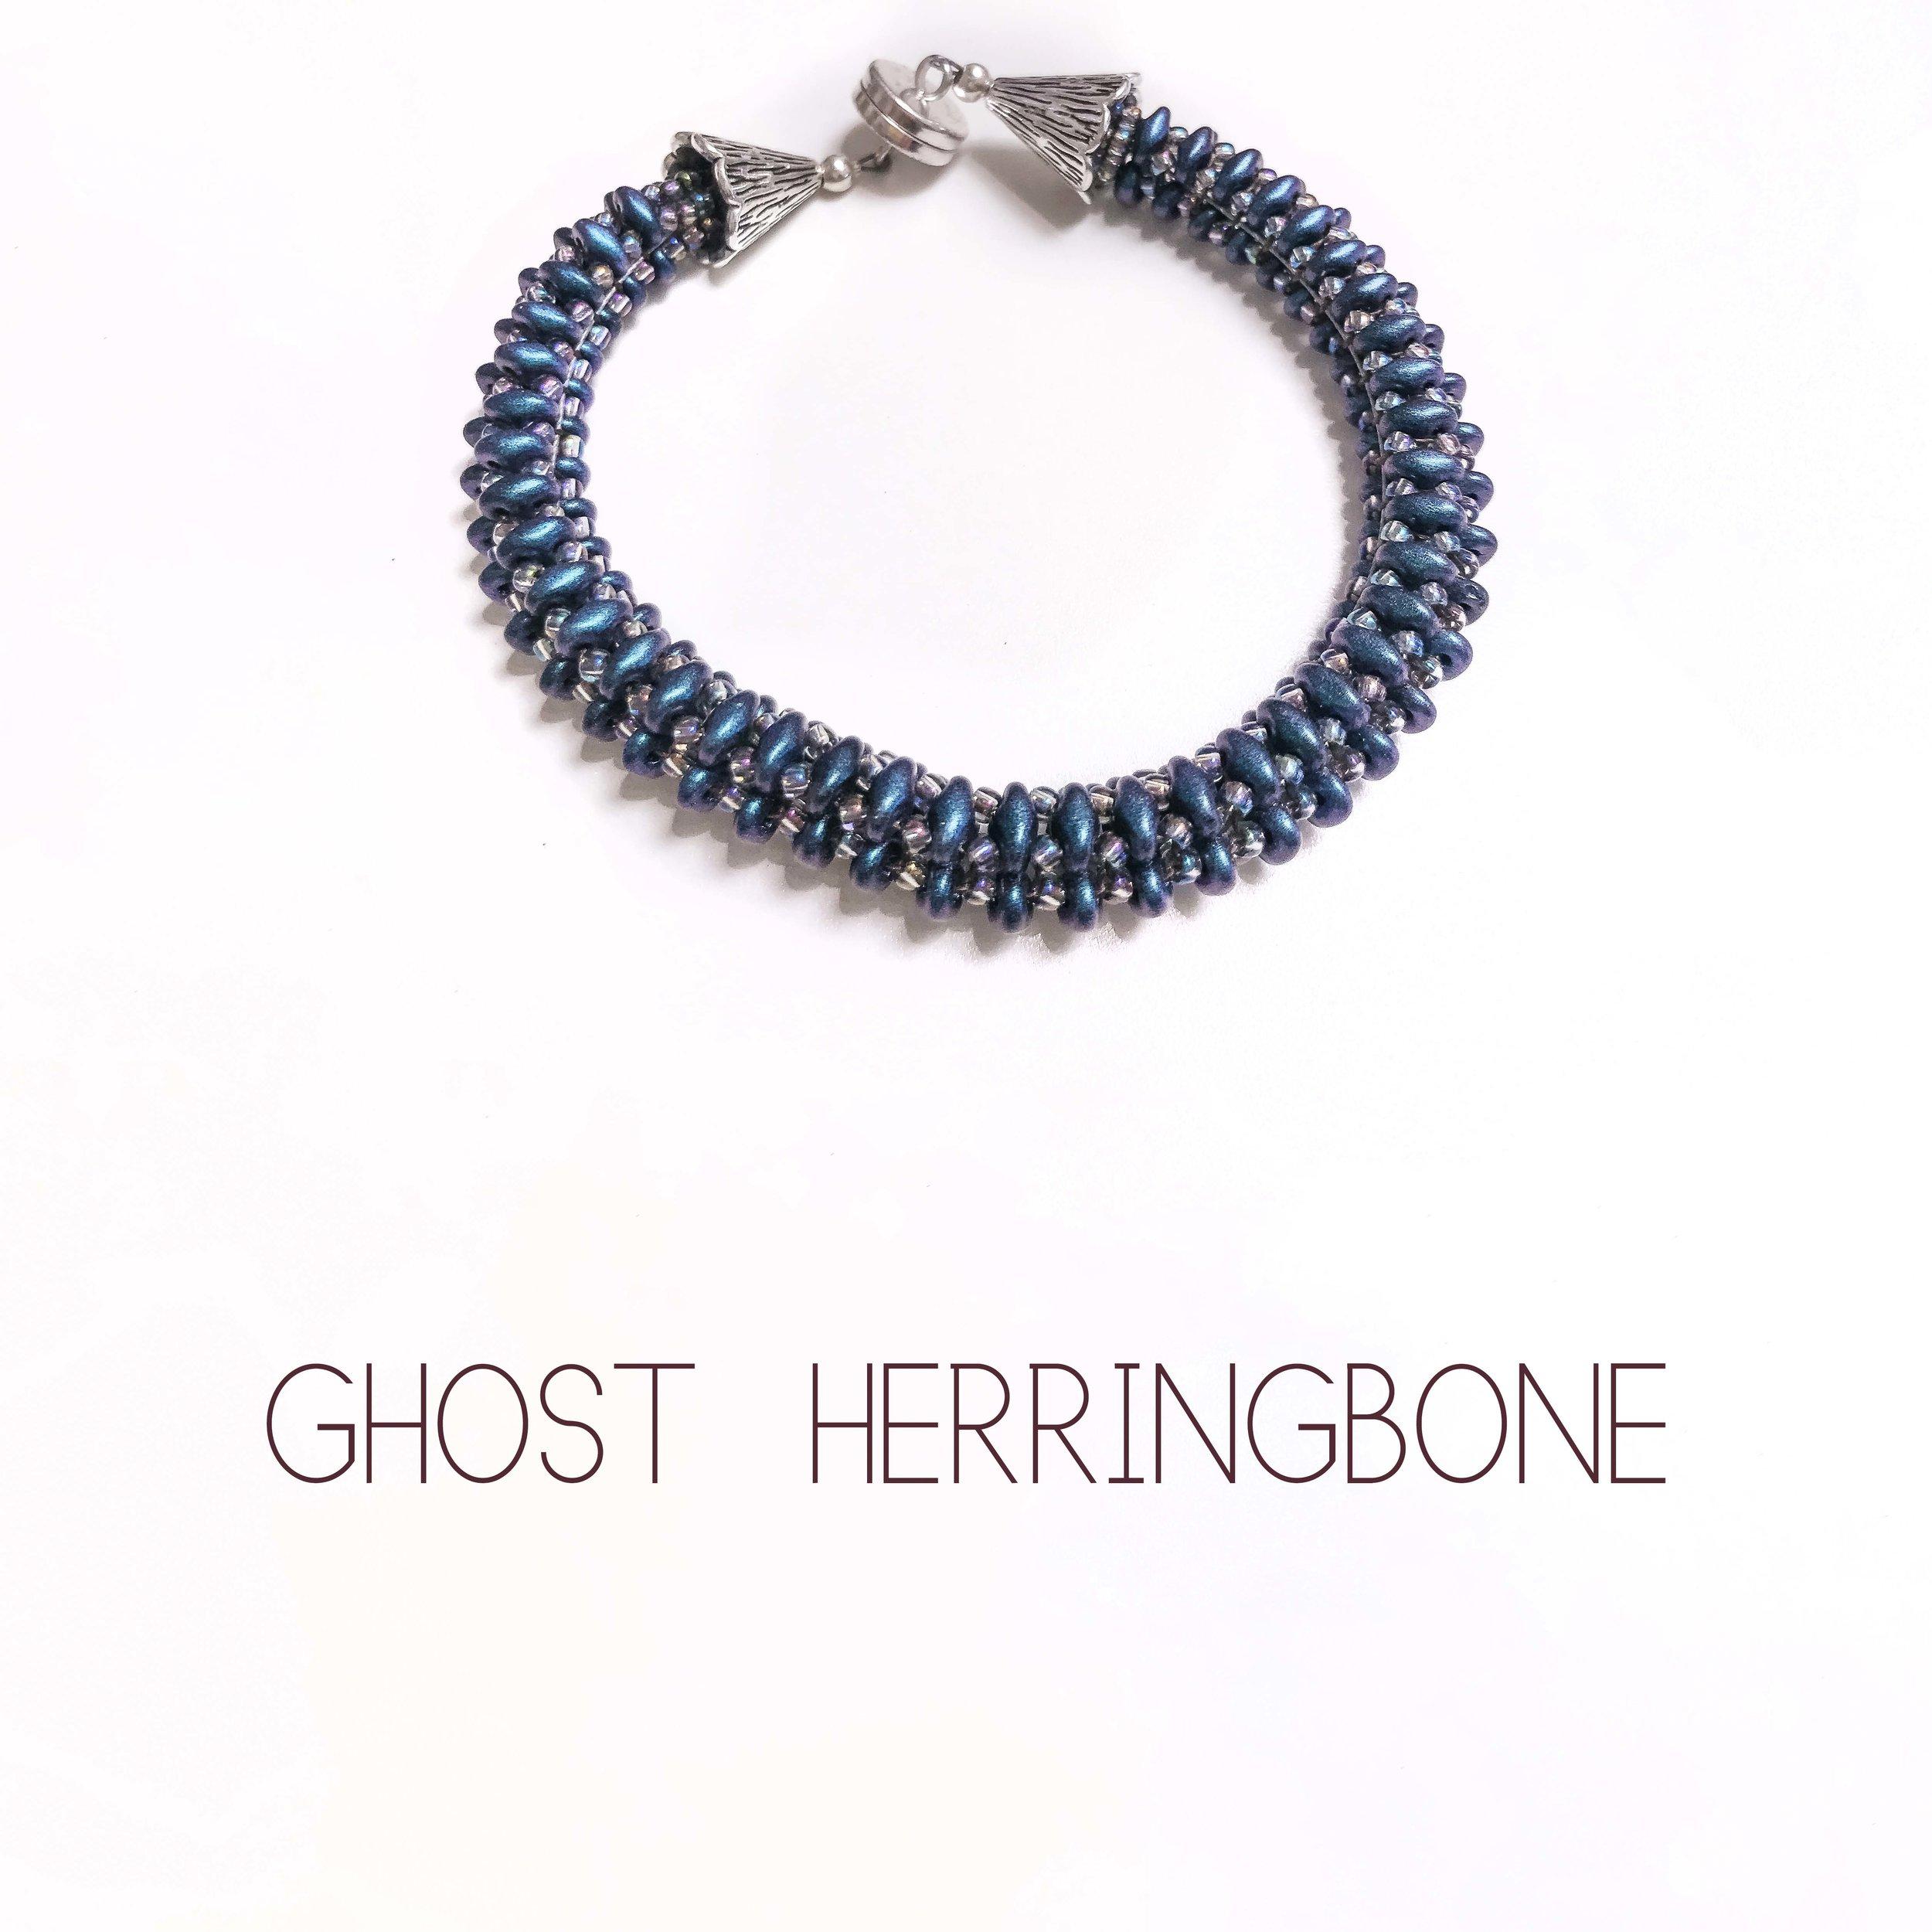 ghostherringbone.jpg